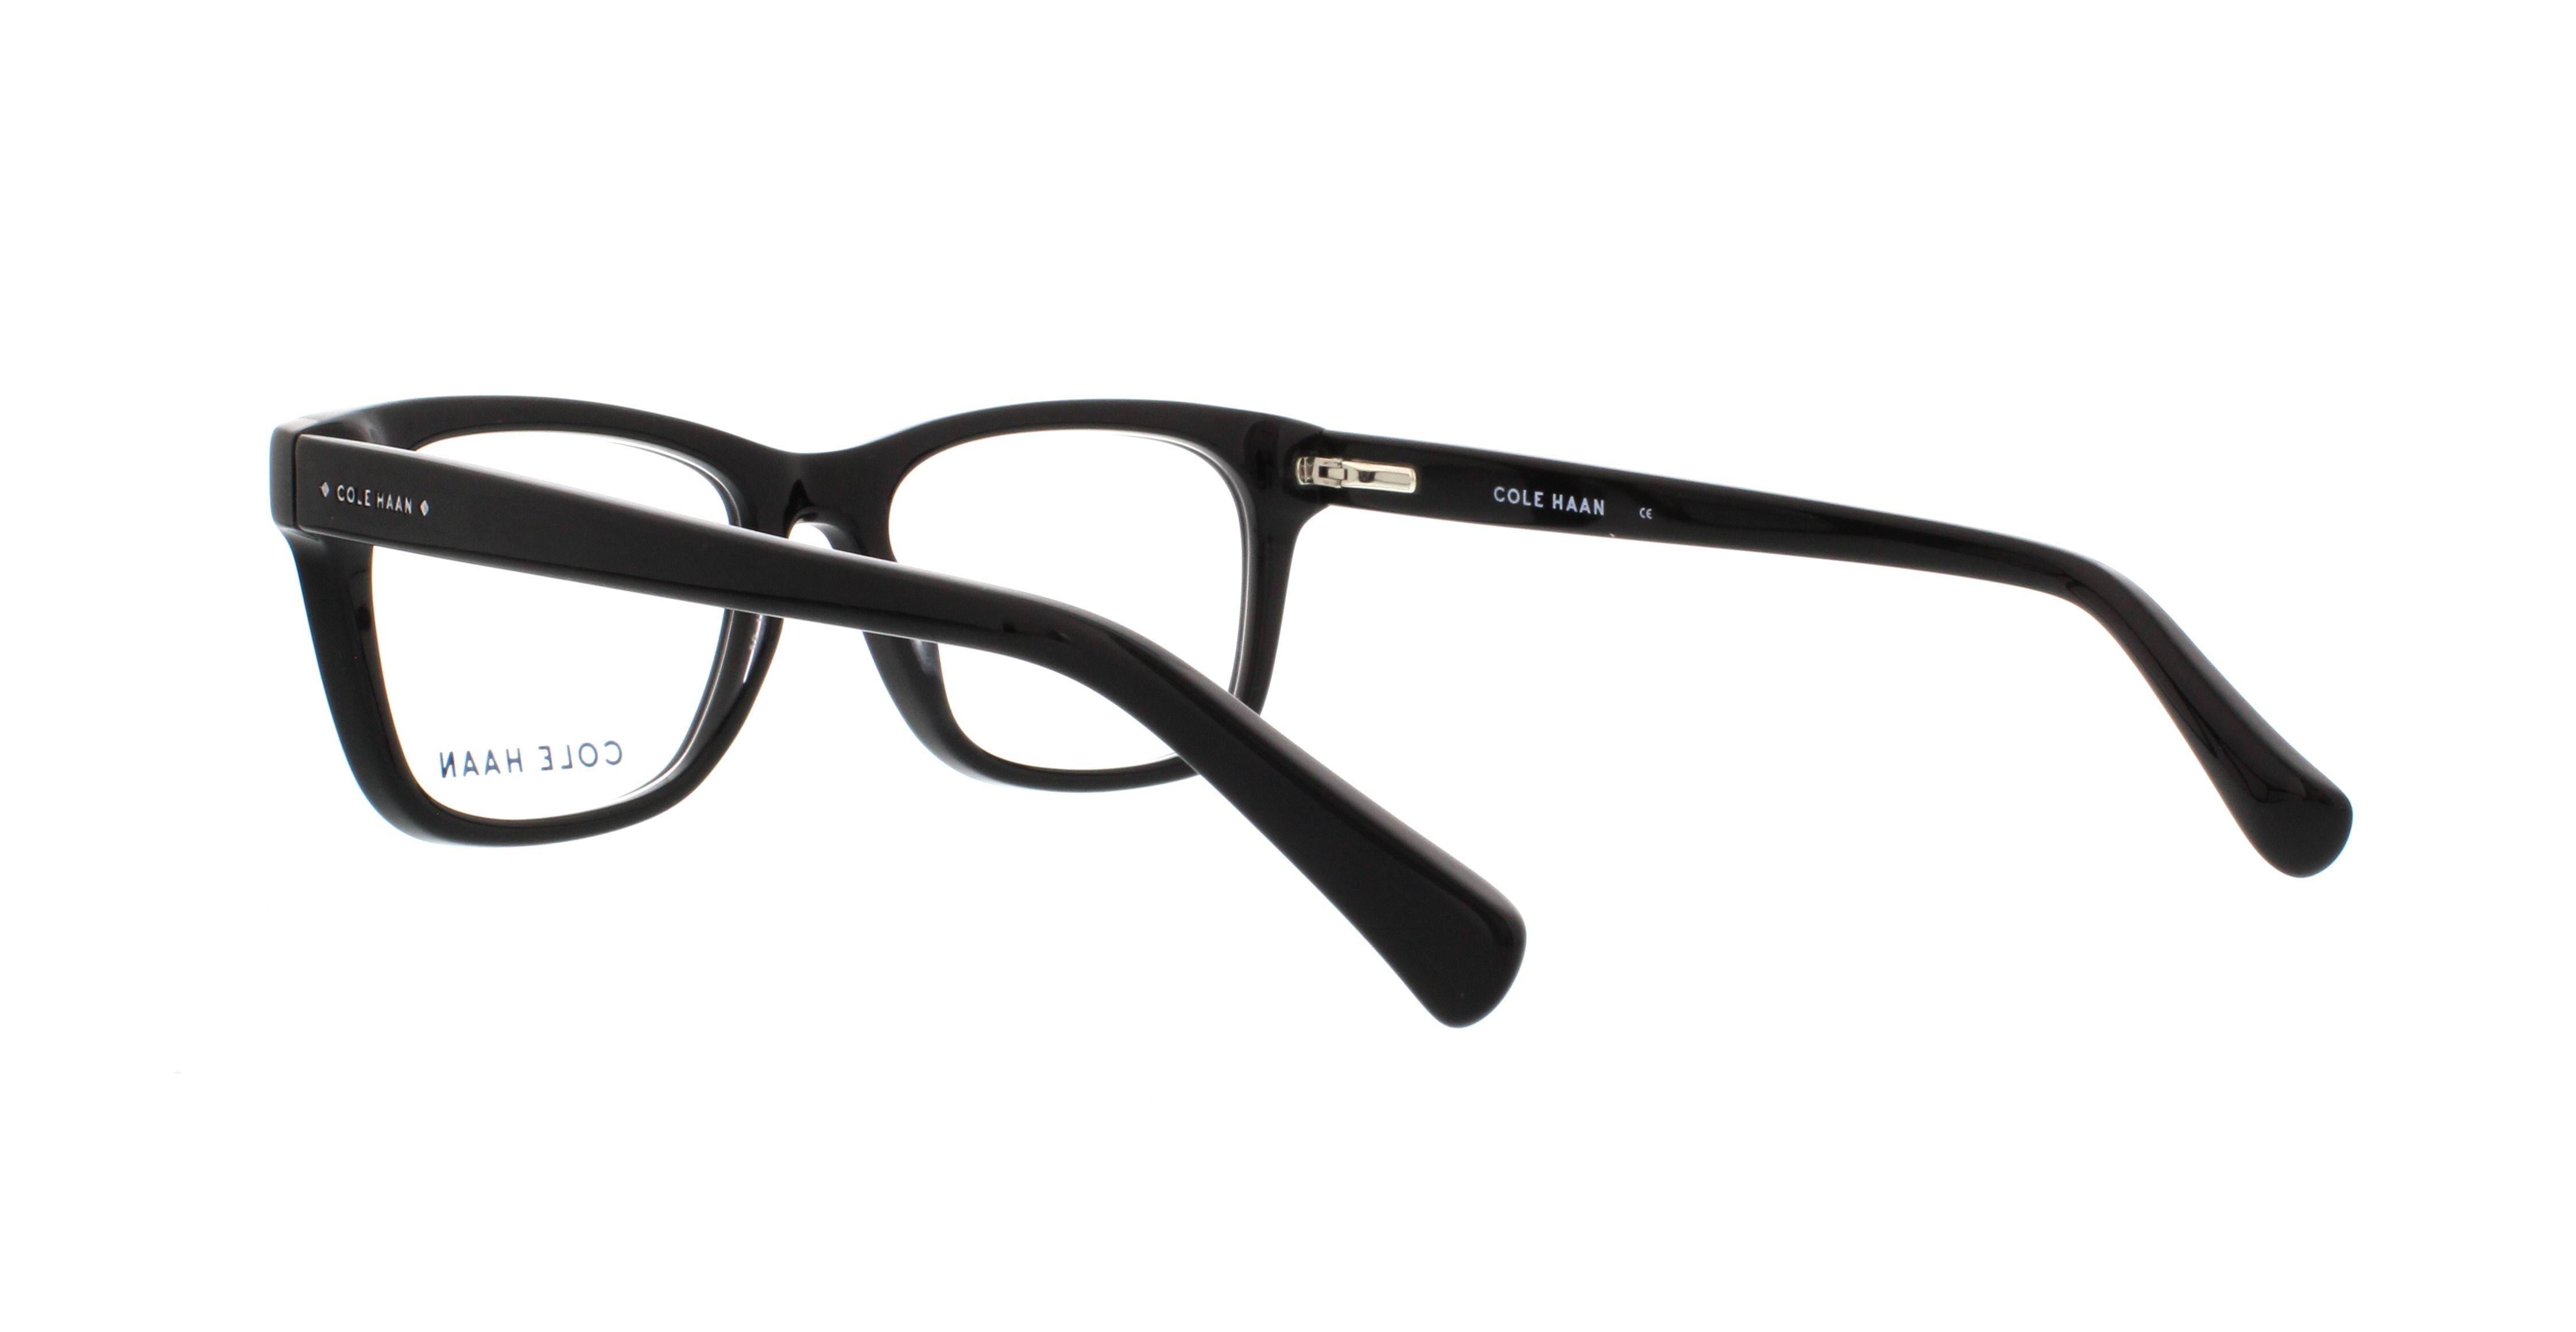 COLE HAAN Eyeglasses CH4008 001 Black 52MM - Walmart.com